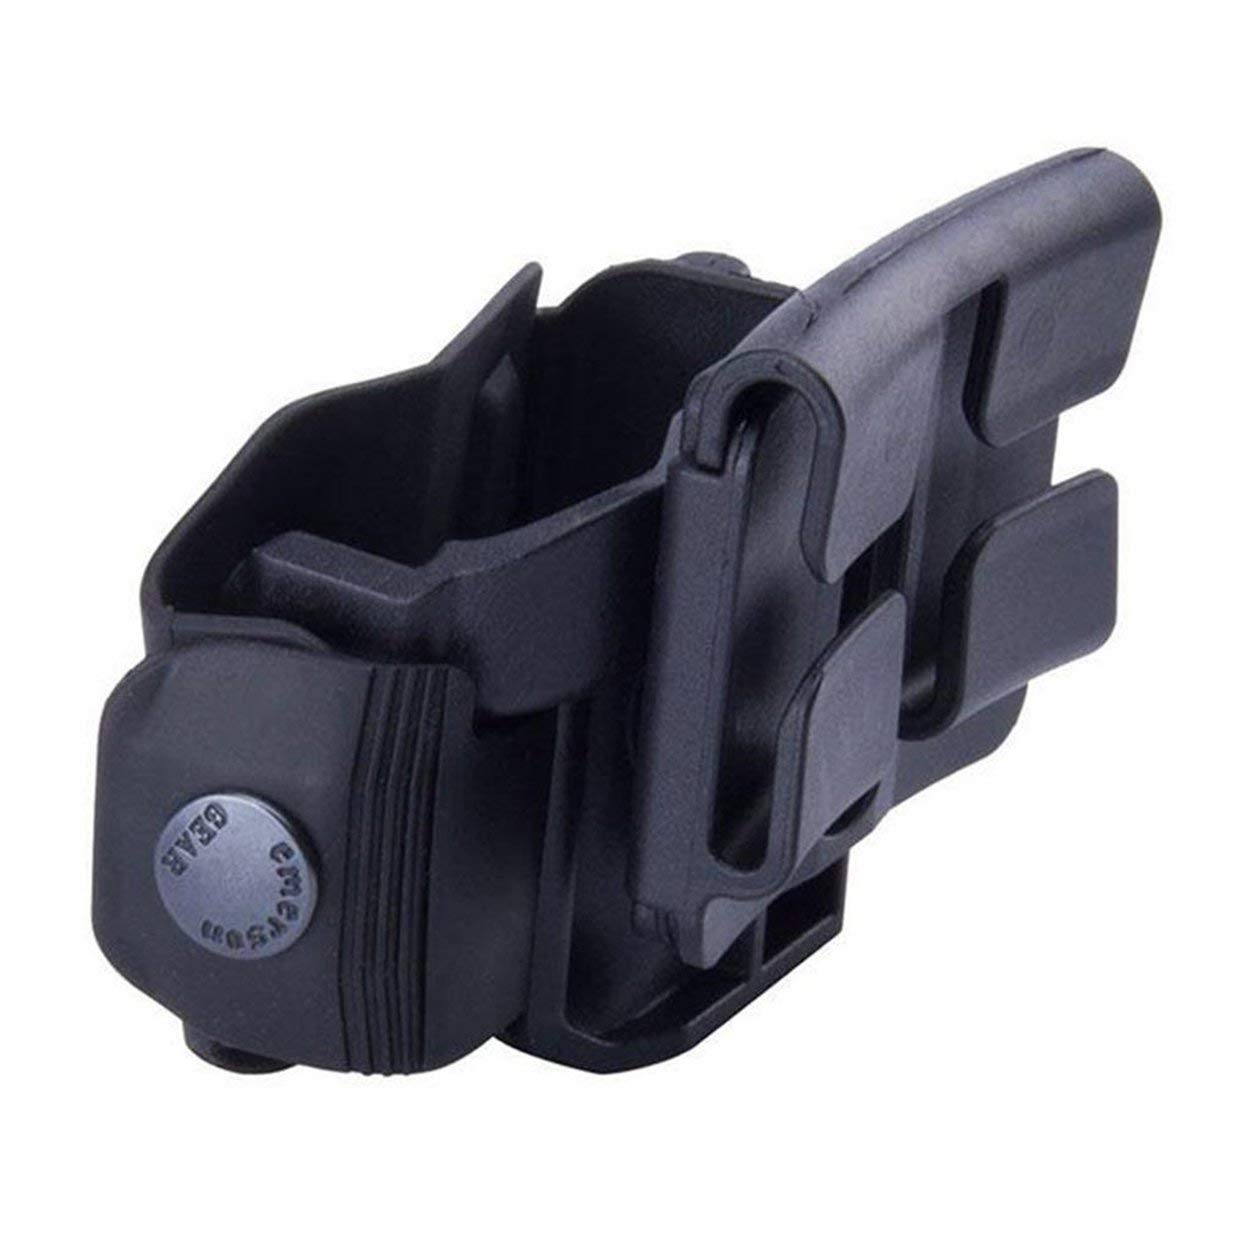 banbie8409 Tactical 360 Rotation Clip Ceinture MOLLE Holster Rotation Chasse pour G17